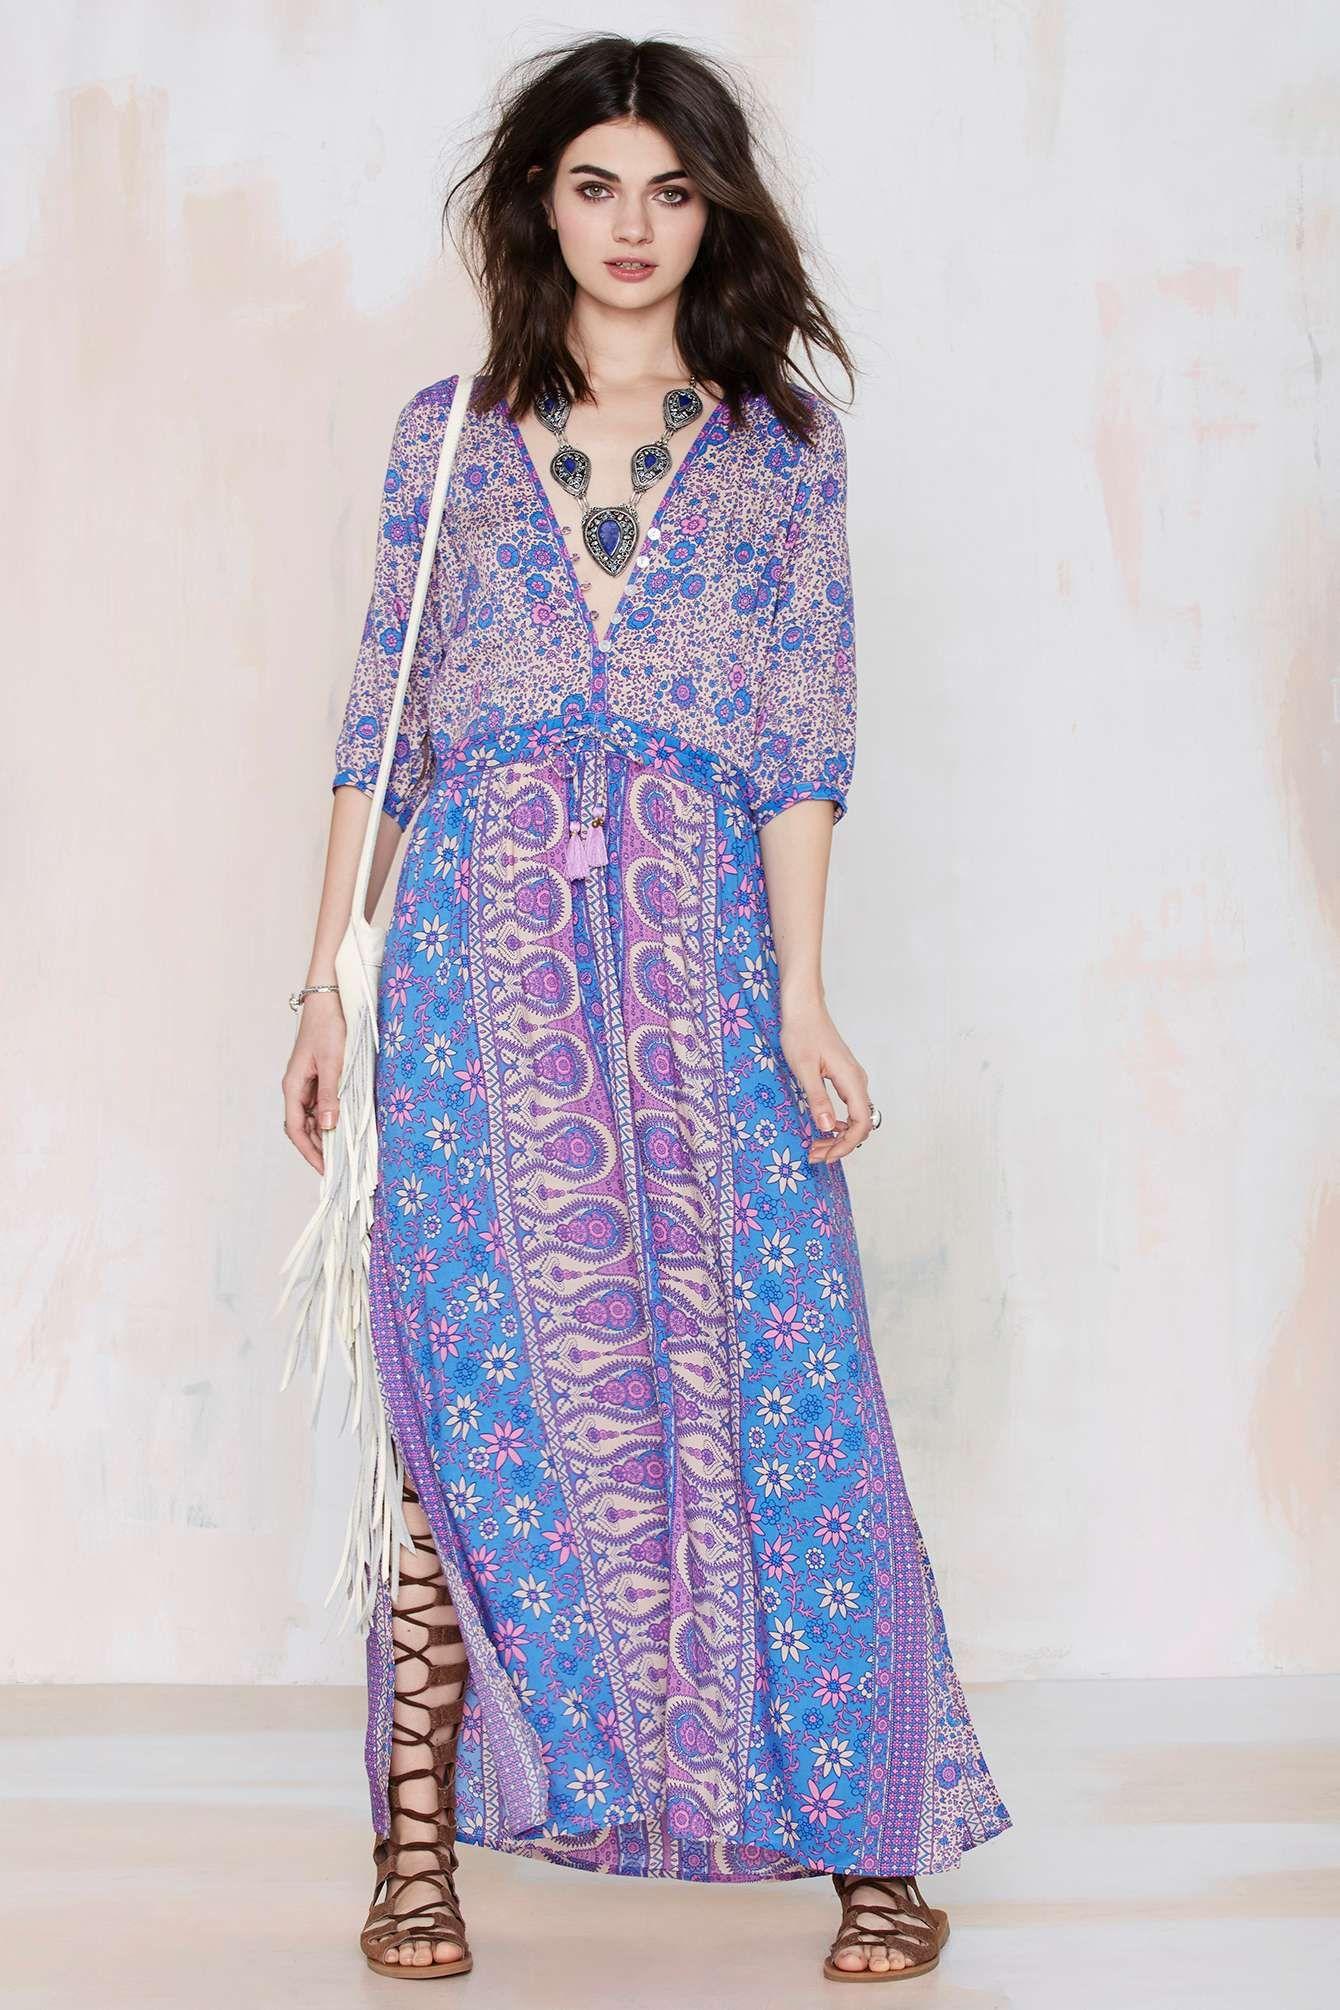 Spell Boho Blossom Maxi Dress Shop Clothes At Nasty Gal Tendencies Long Pants Ash Grey Denim Stretch Abu Tua 32